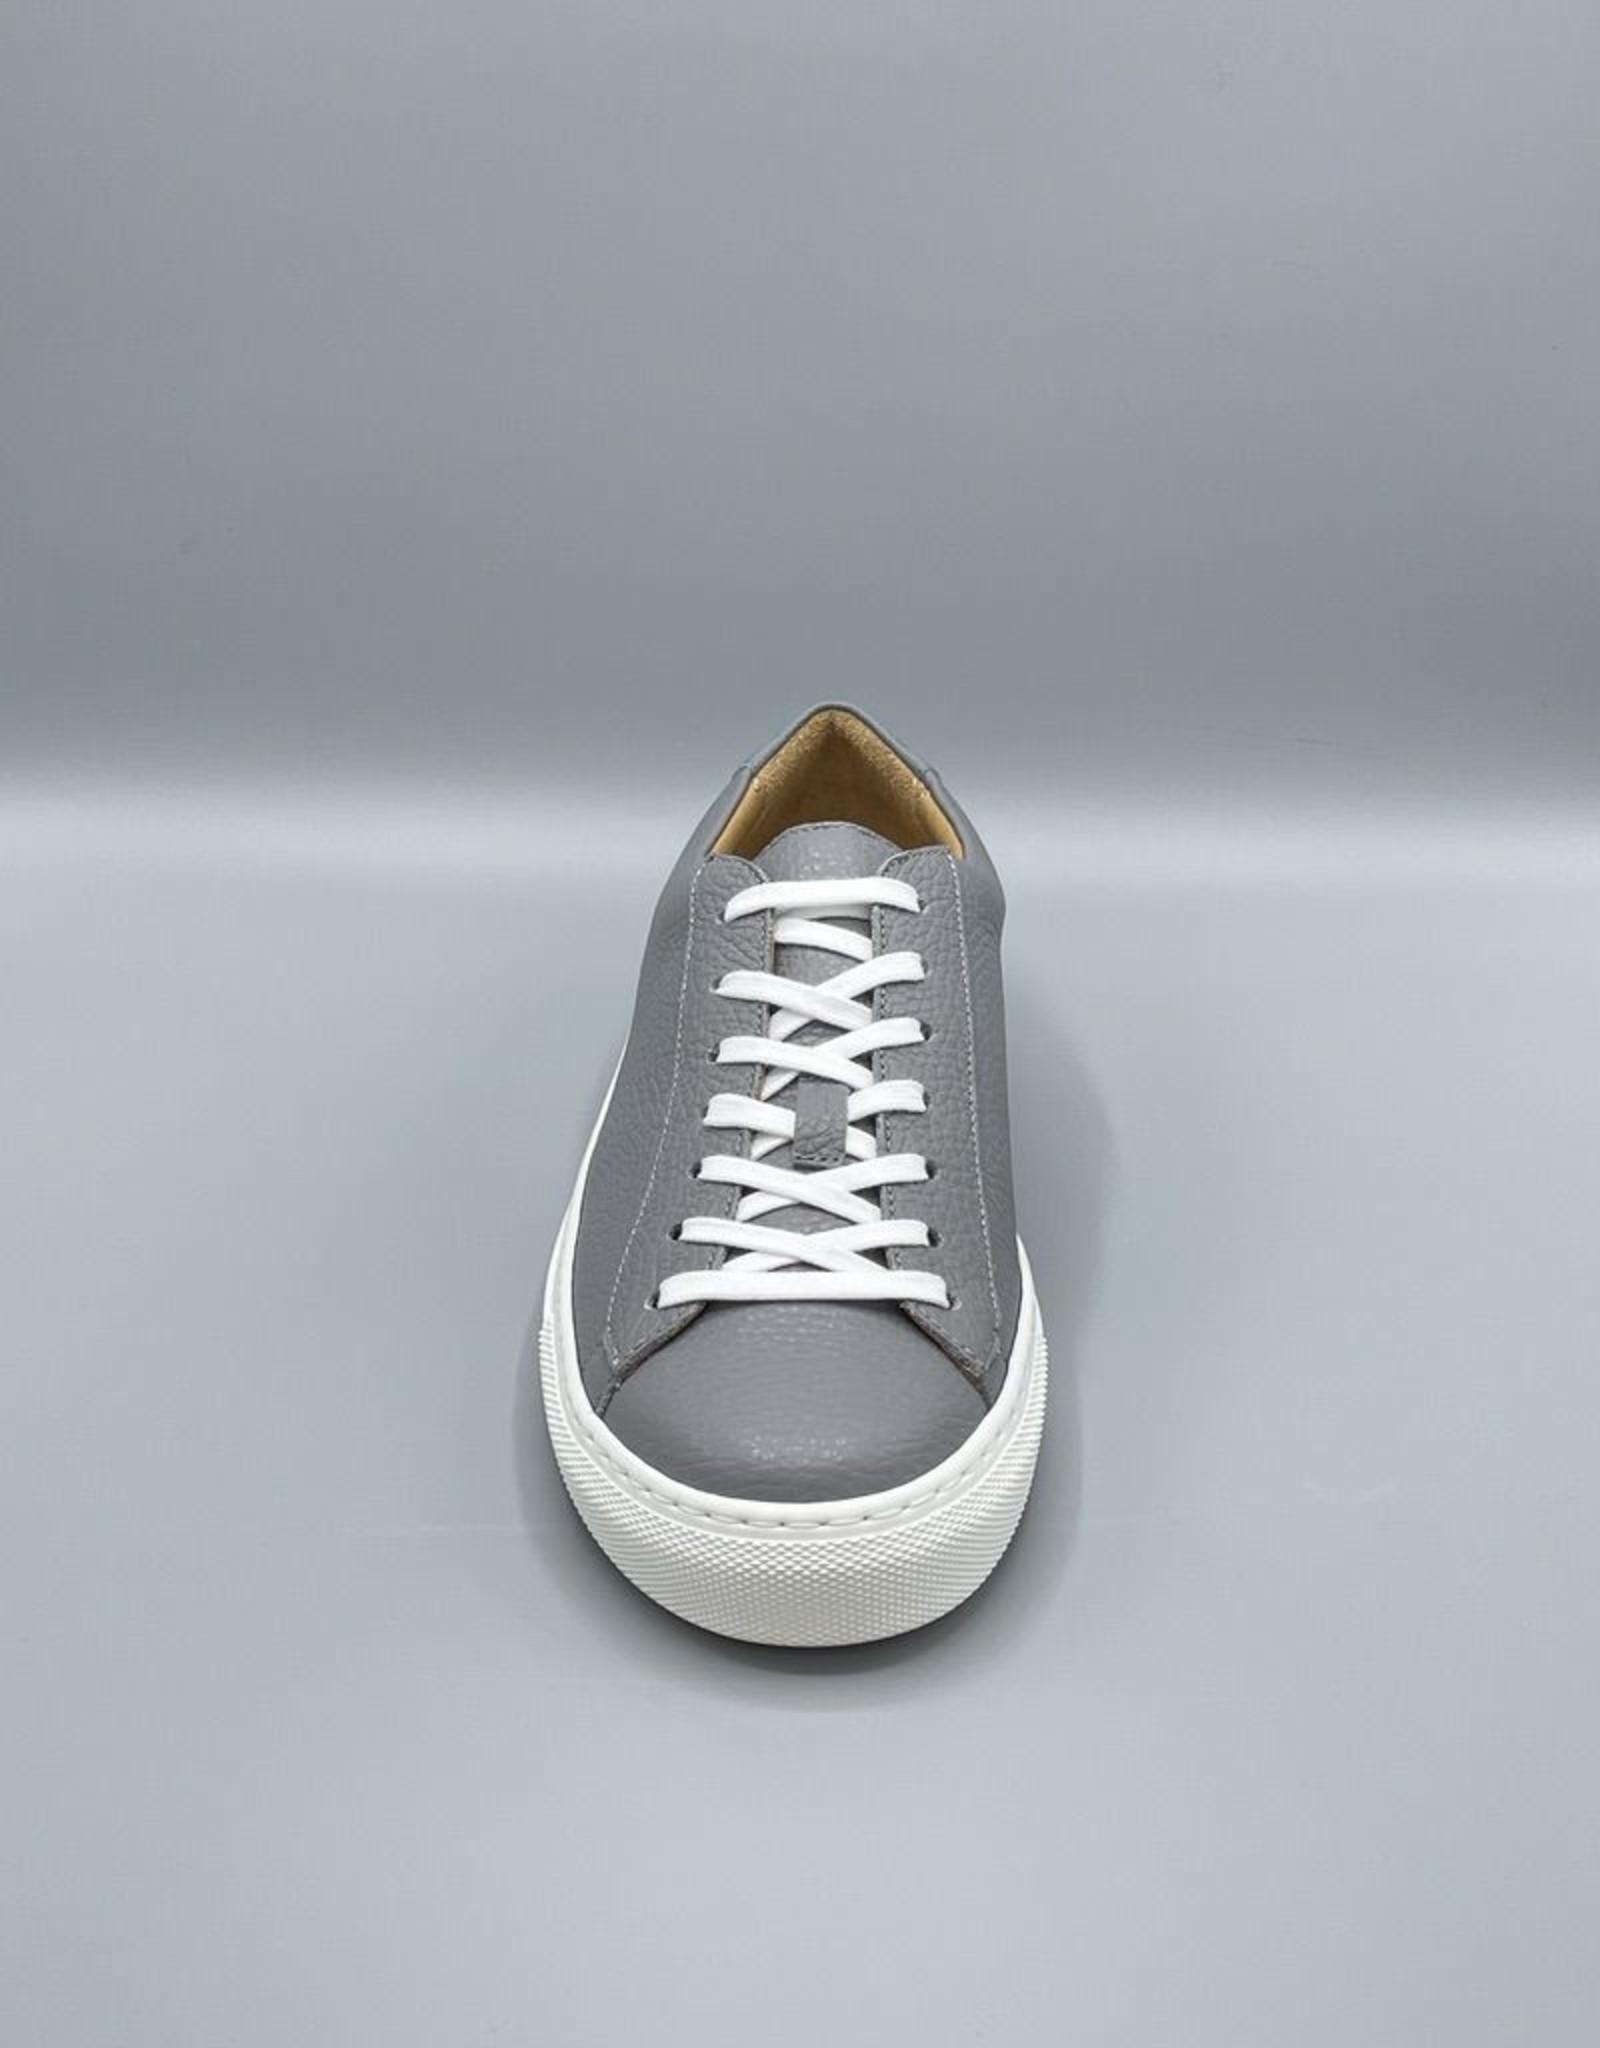 Manovie Toscane Manovie Toscane Filo White Sole Adria Sneaker